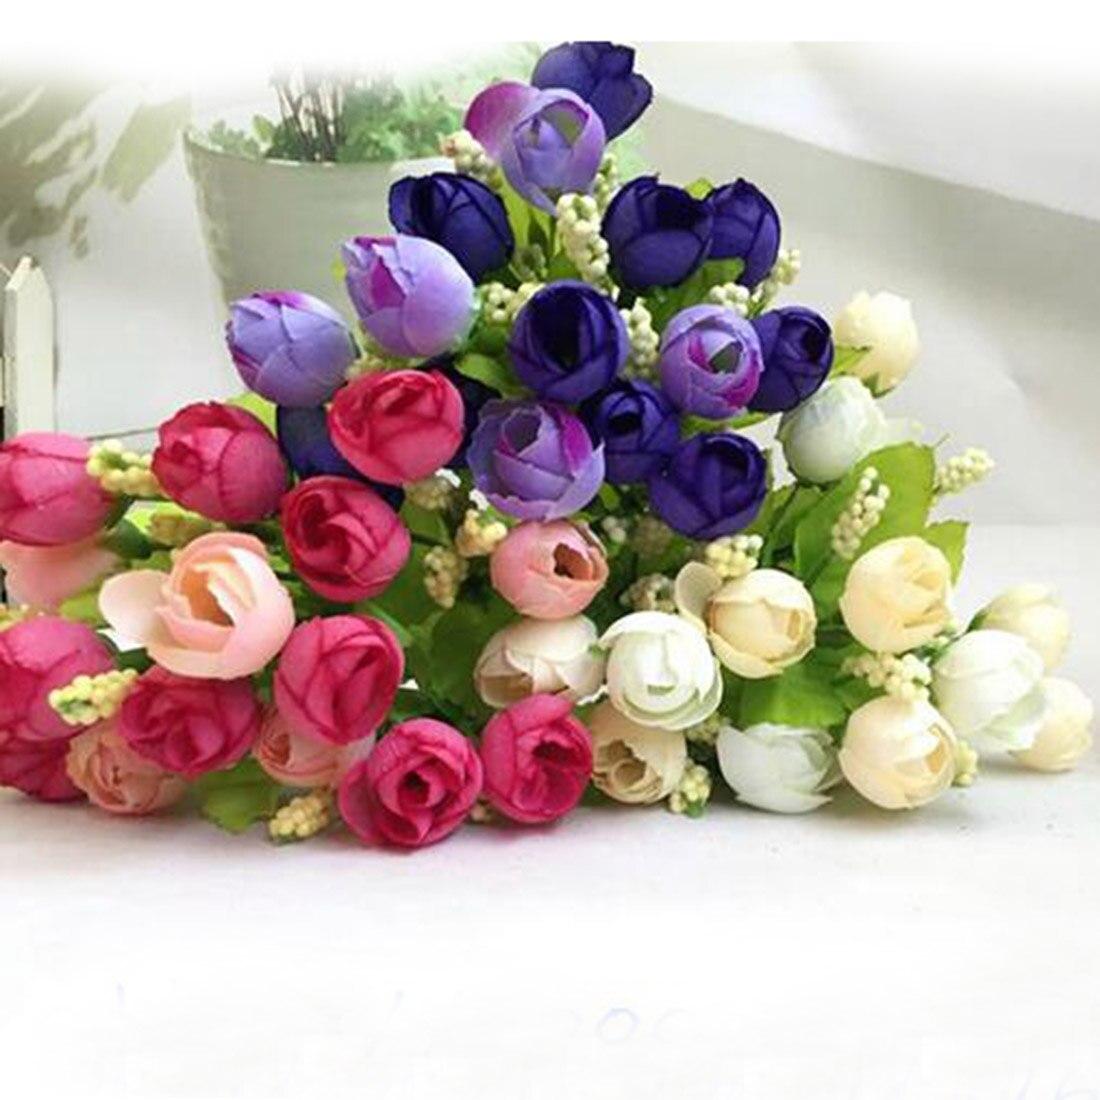 Superior de La Manera Hermosa Artificial Mini Rose Buds 15 Yemas 1 Ramo de La Bo